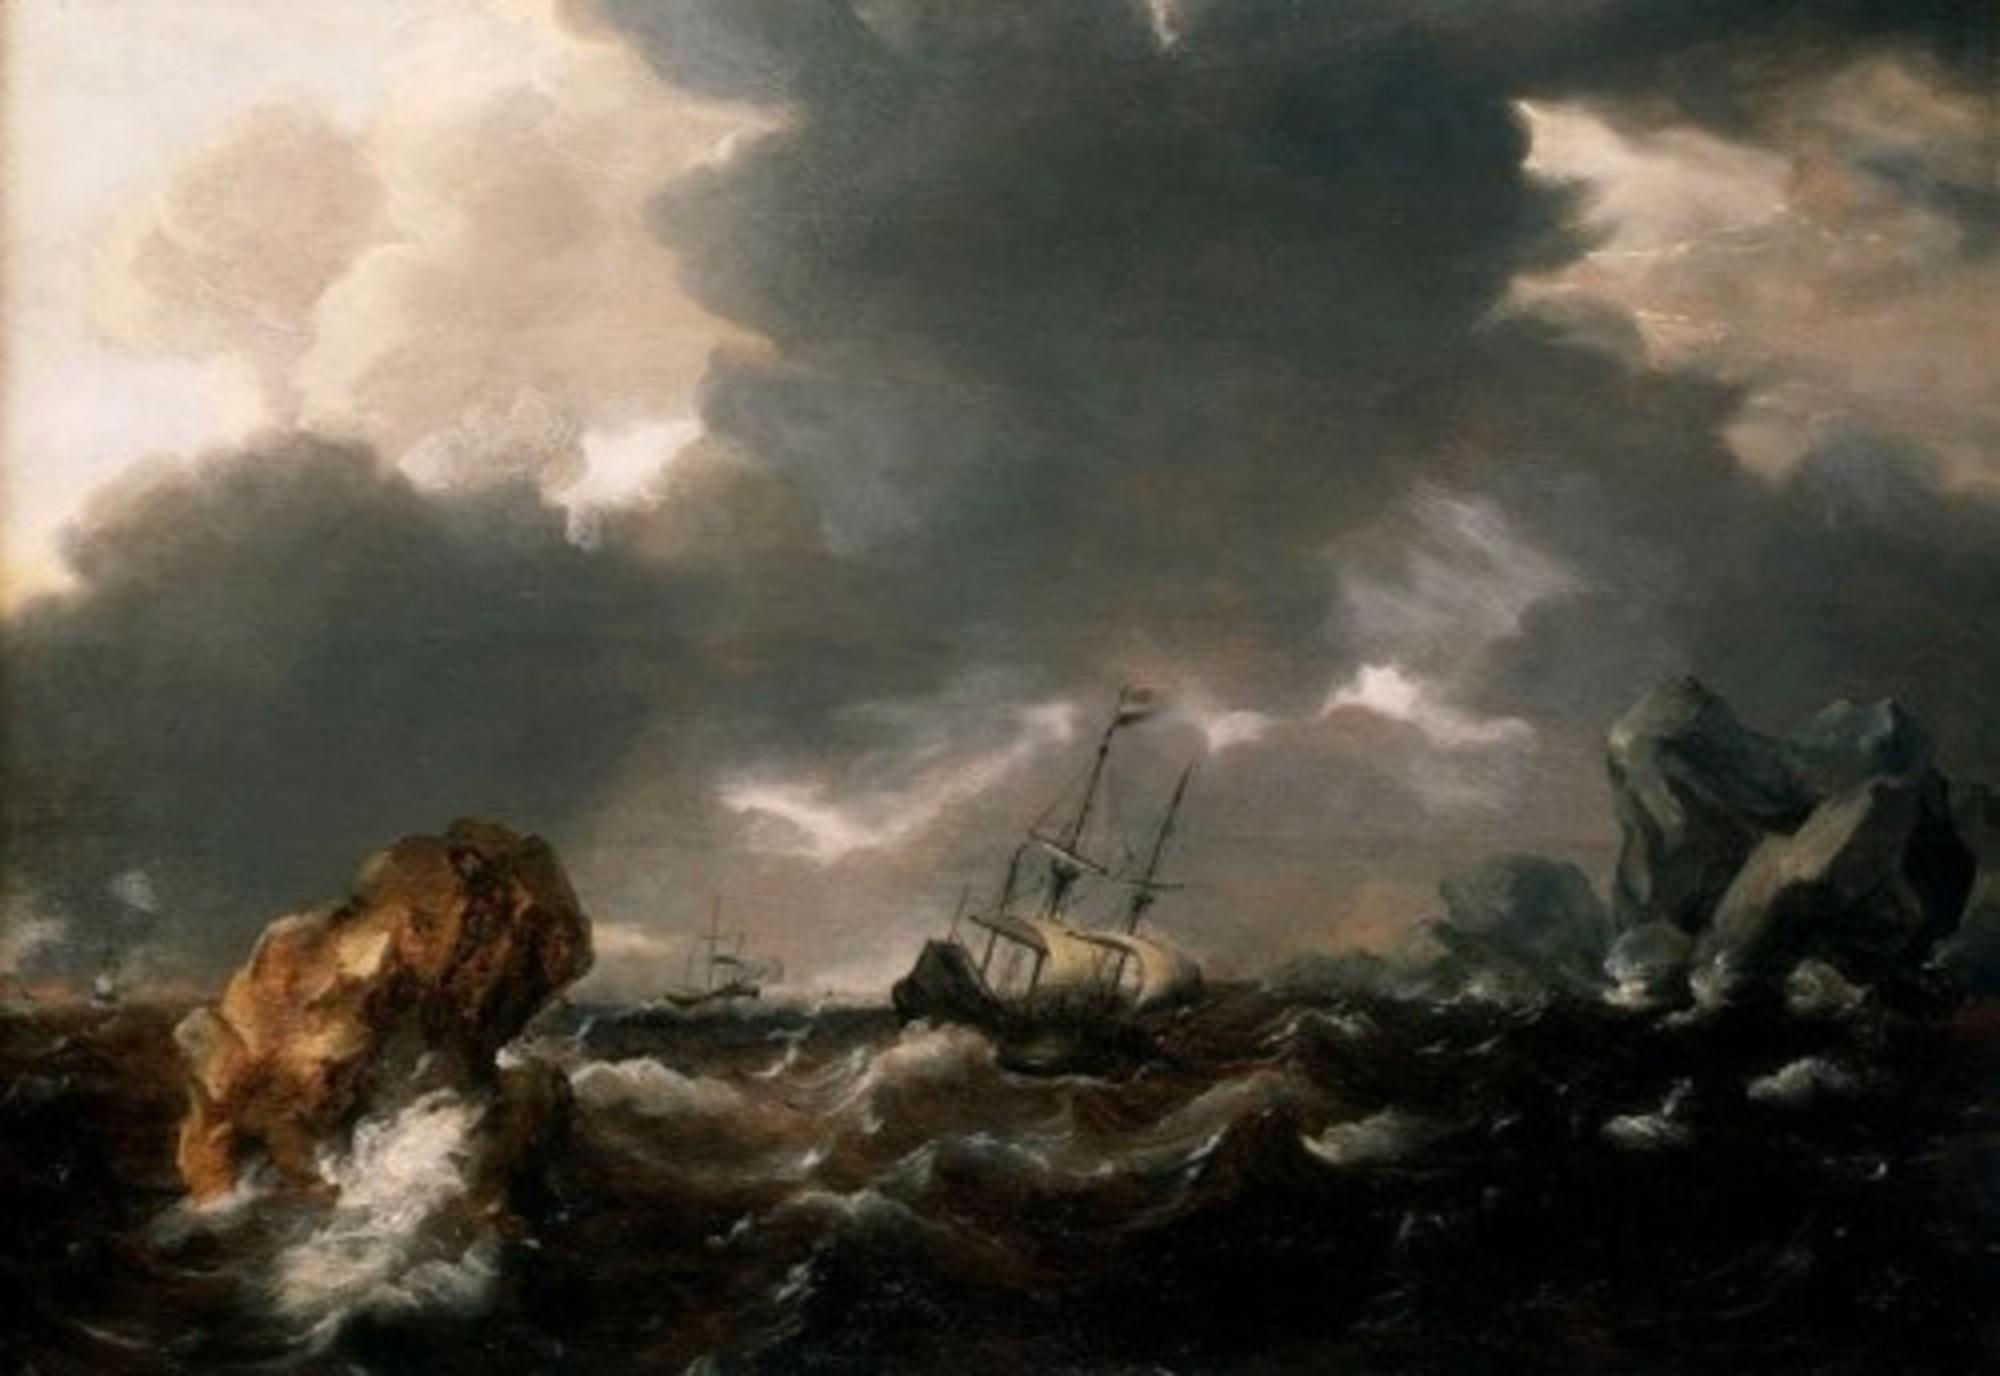 Willem-van-de-Velde-the-Younger---A-Dutch-Merchant-Ship-Running-Between-Rocks-in-Rough-Weather.jpg